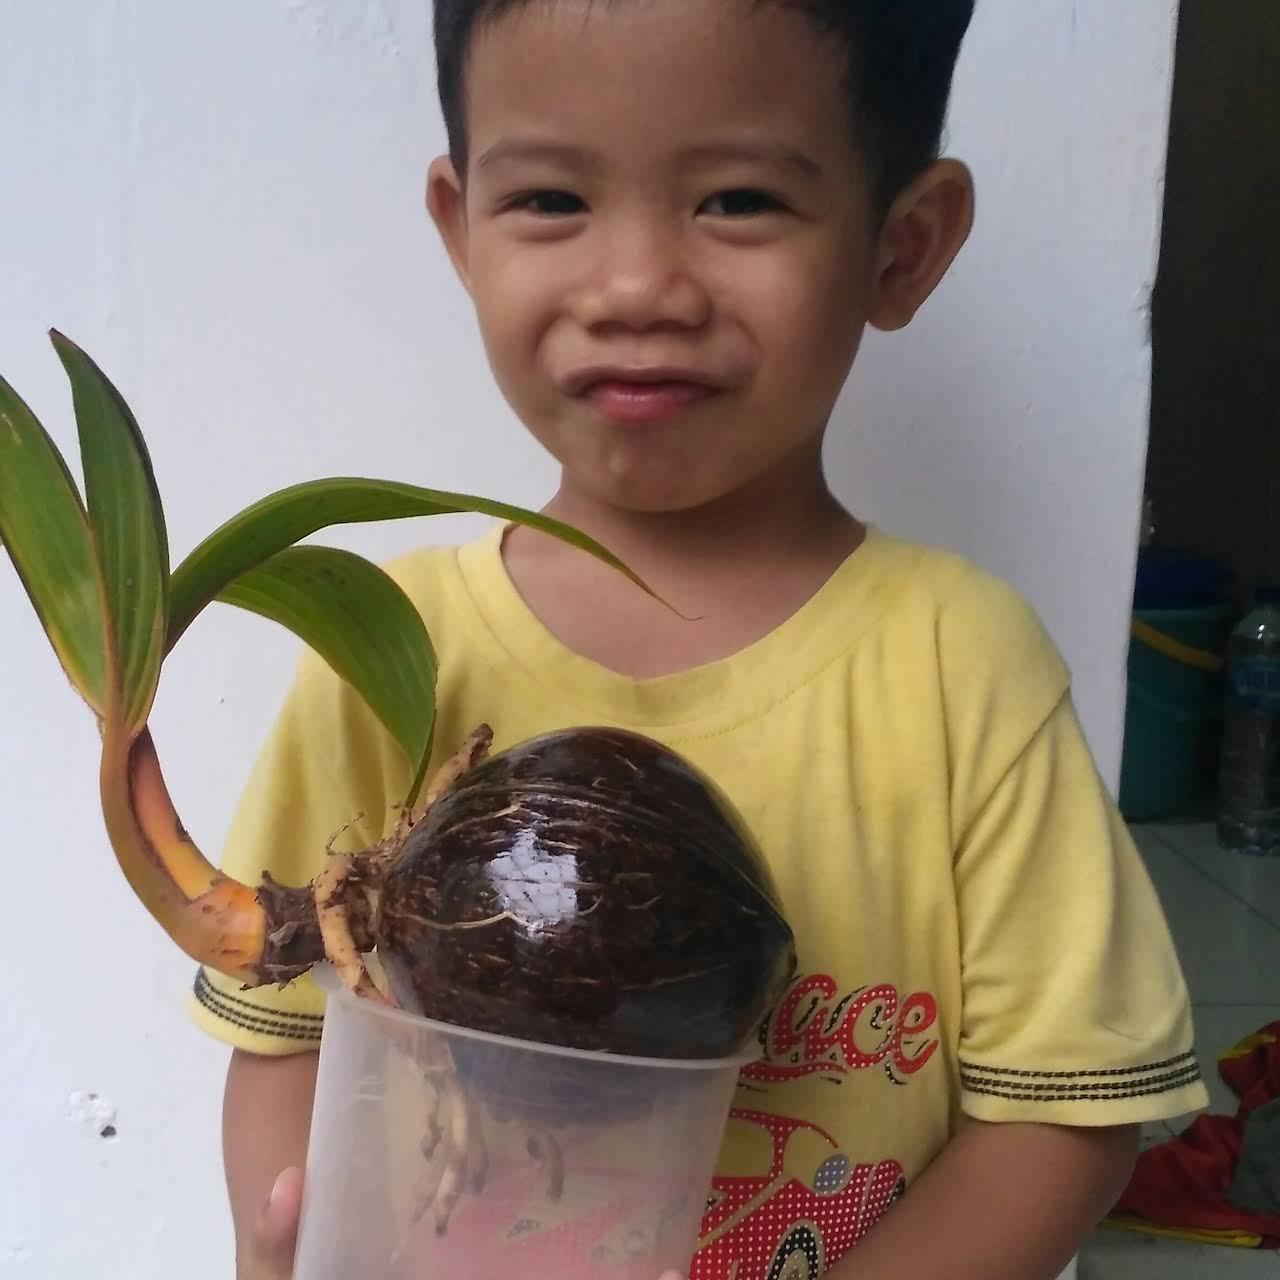 Jual Bonsai Kelapa Antik Jakarta Toko Perlengkapan Rumah